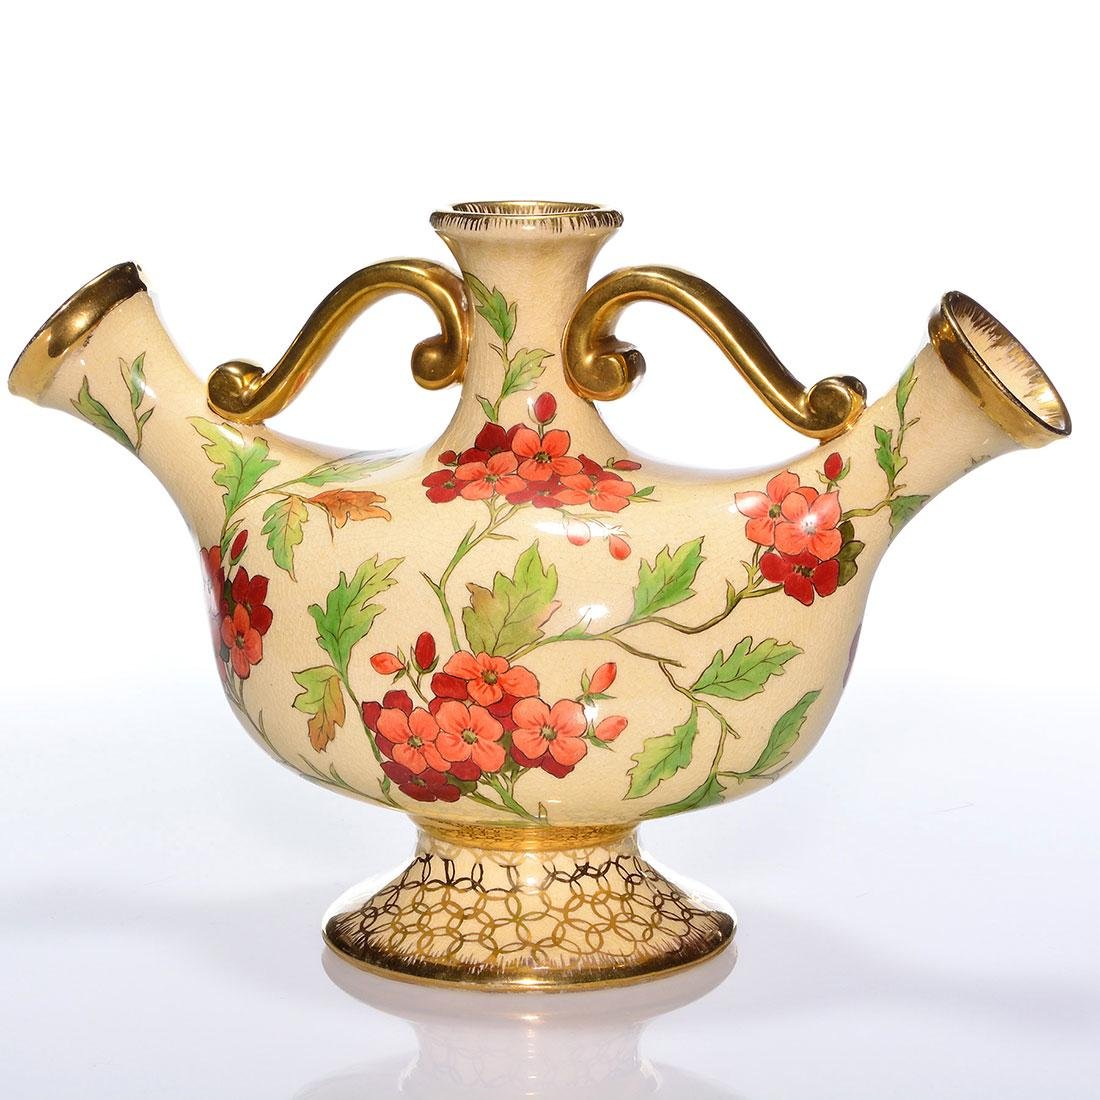 Cincinnati Art Pottery triple spout jug, red flowers, 9 - 2